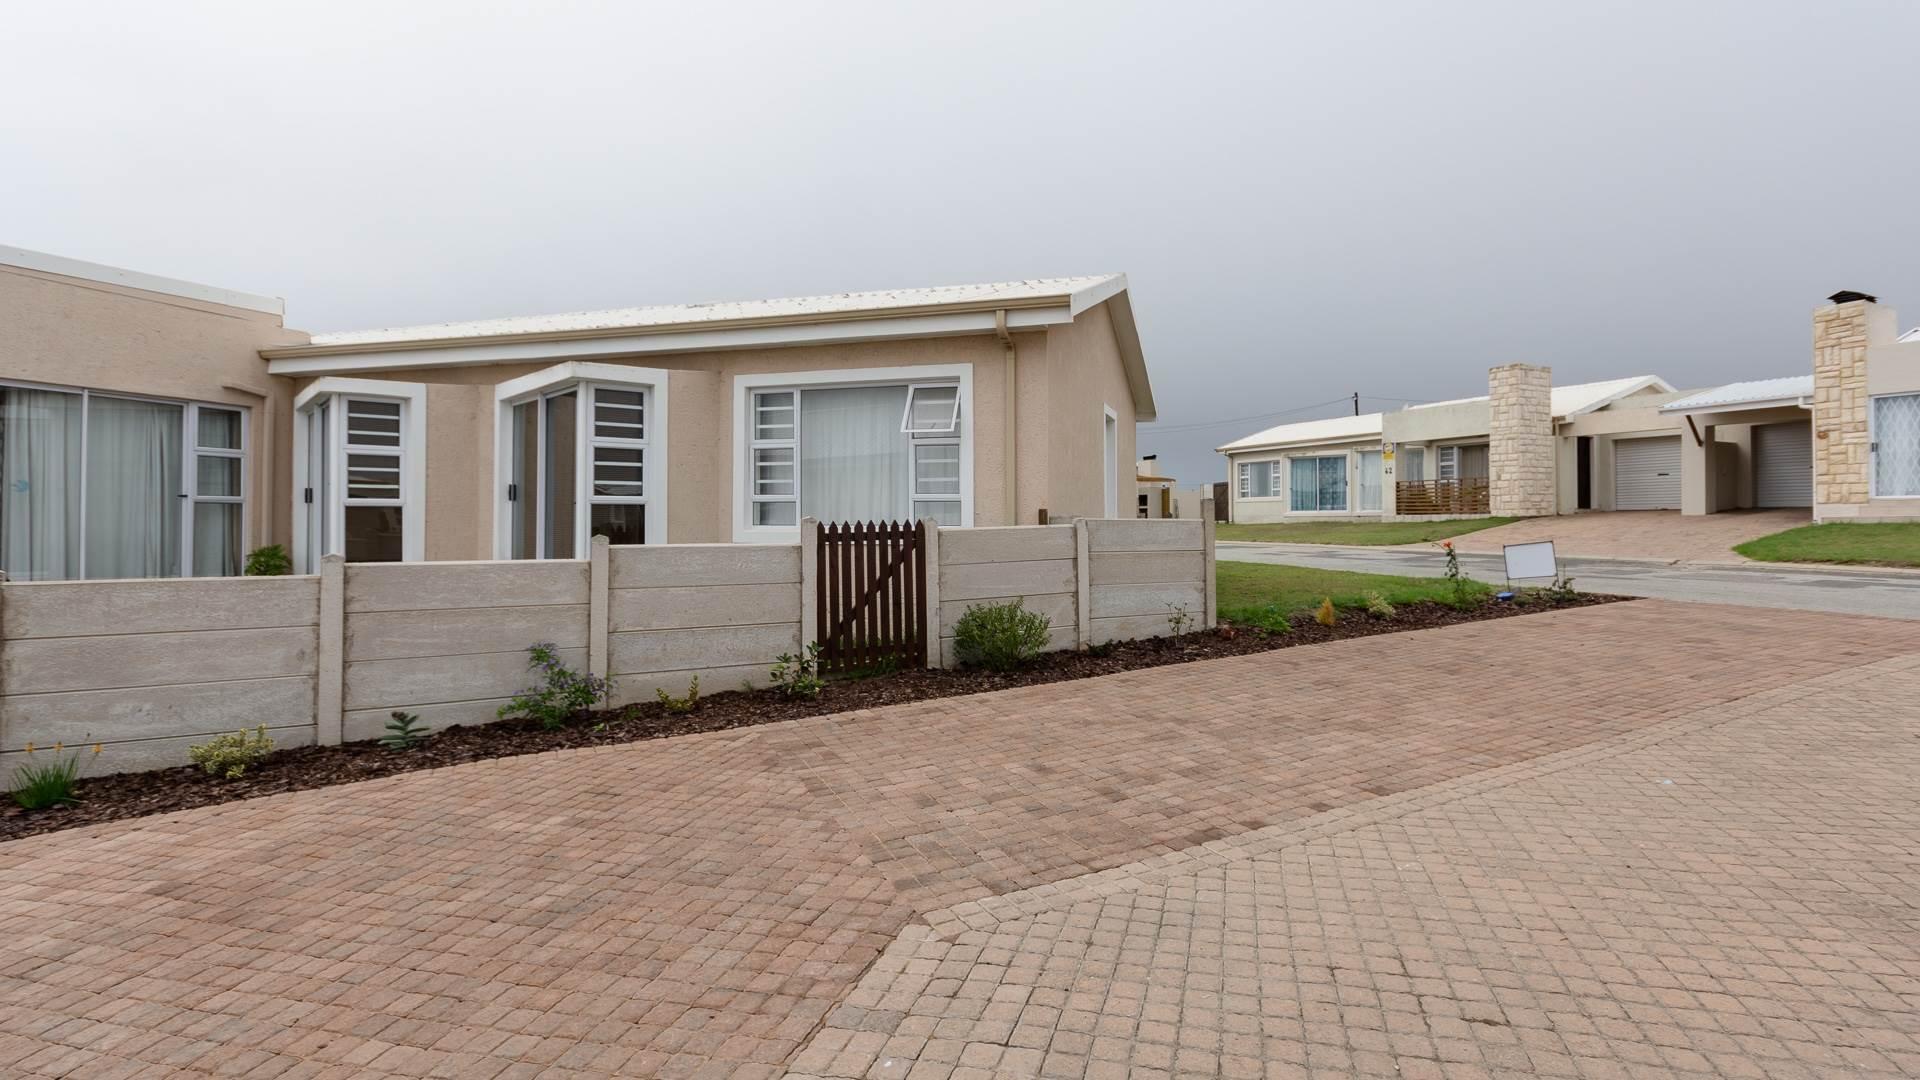 3 BedroomHouse For Sale In Heiderand